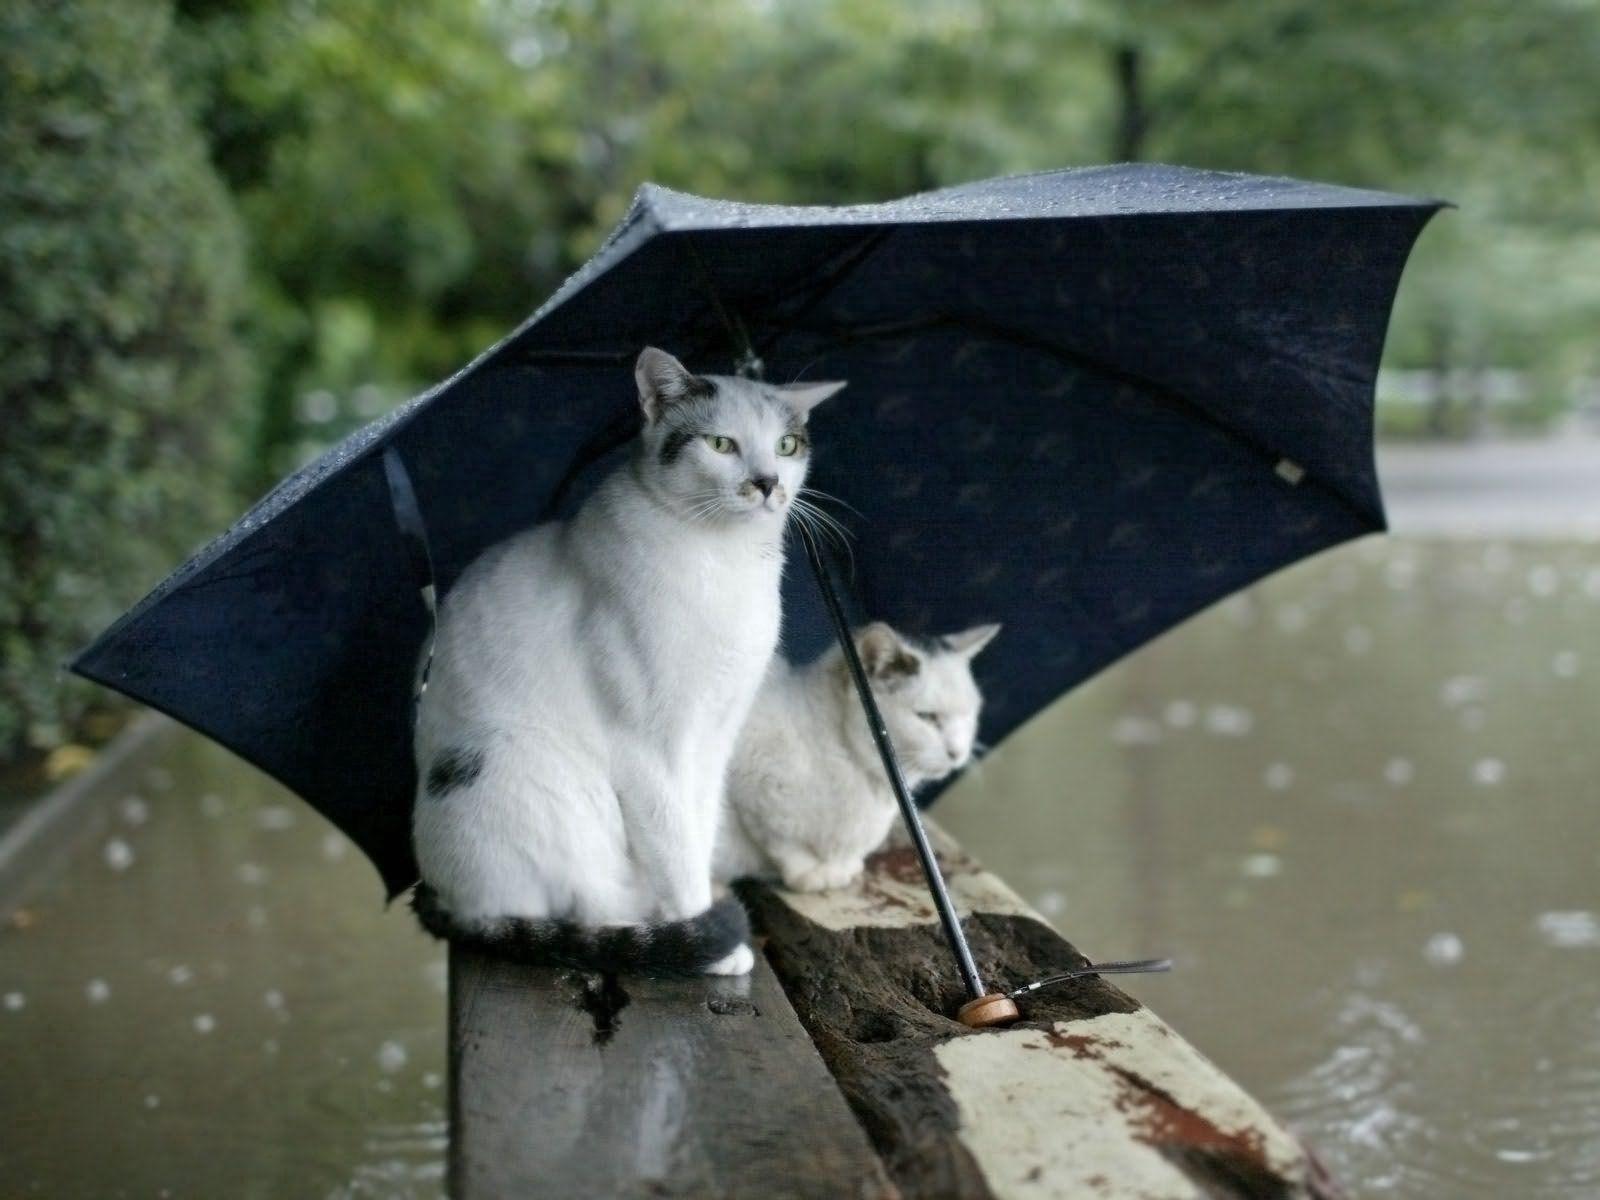 Handy-Wallpaper Tiere, Katzen, Paar, Gefleckt, Regenschirm, Entdeckt kostenlos herunterladen.